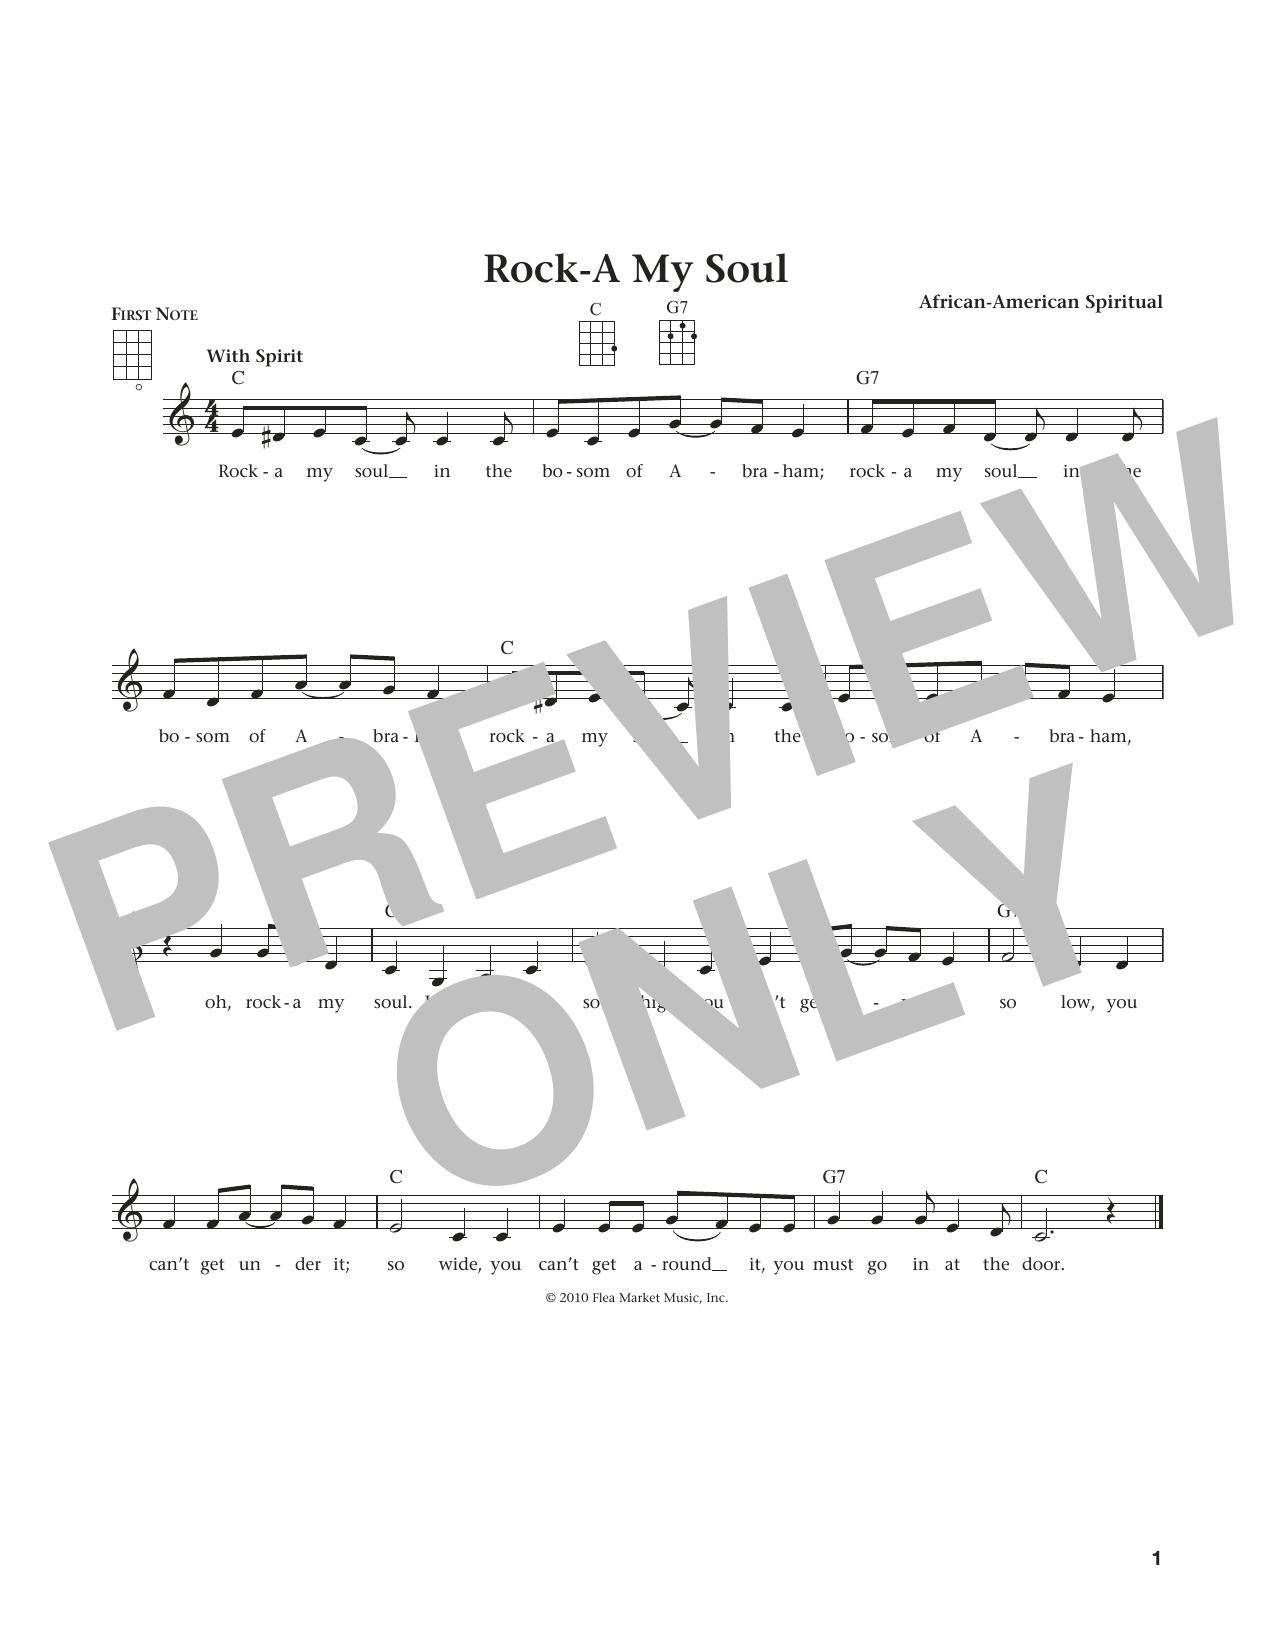 Rock-A-My Soul (from The Daily Ukulele) (arr. Liz and Jim Beloff) (Ukulele)